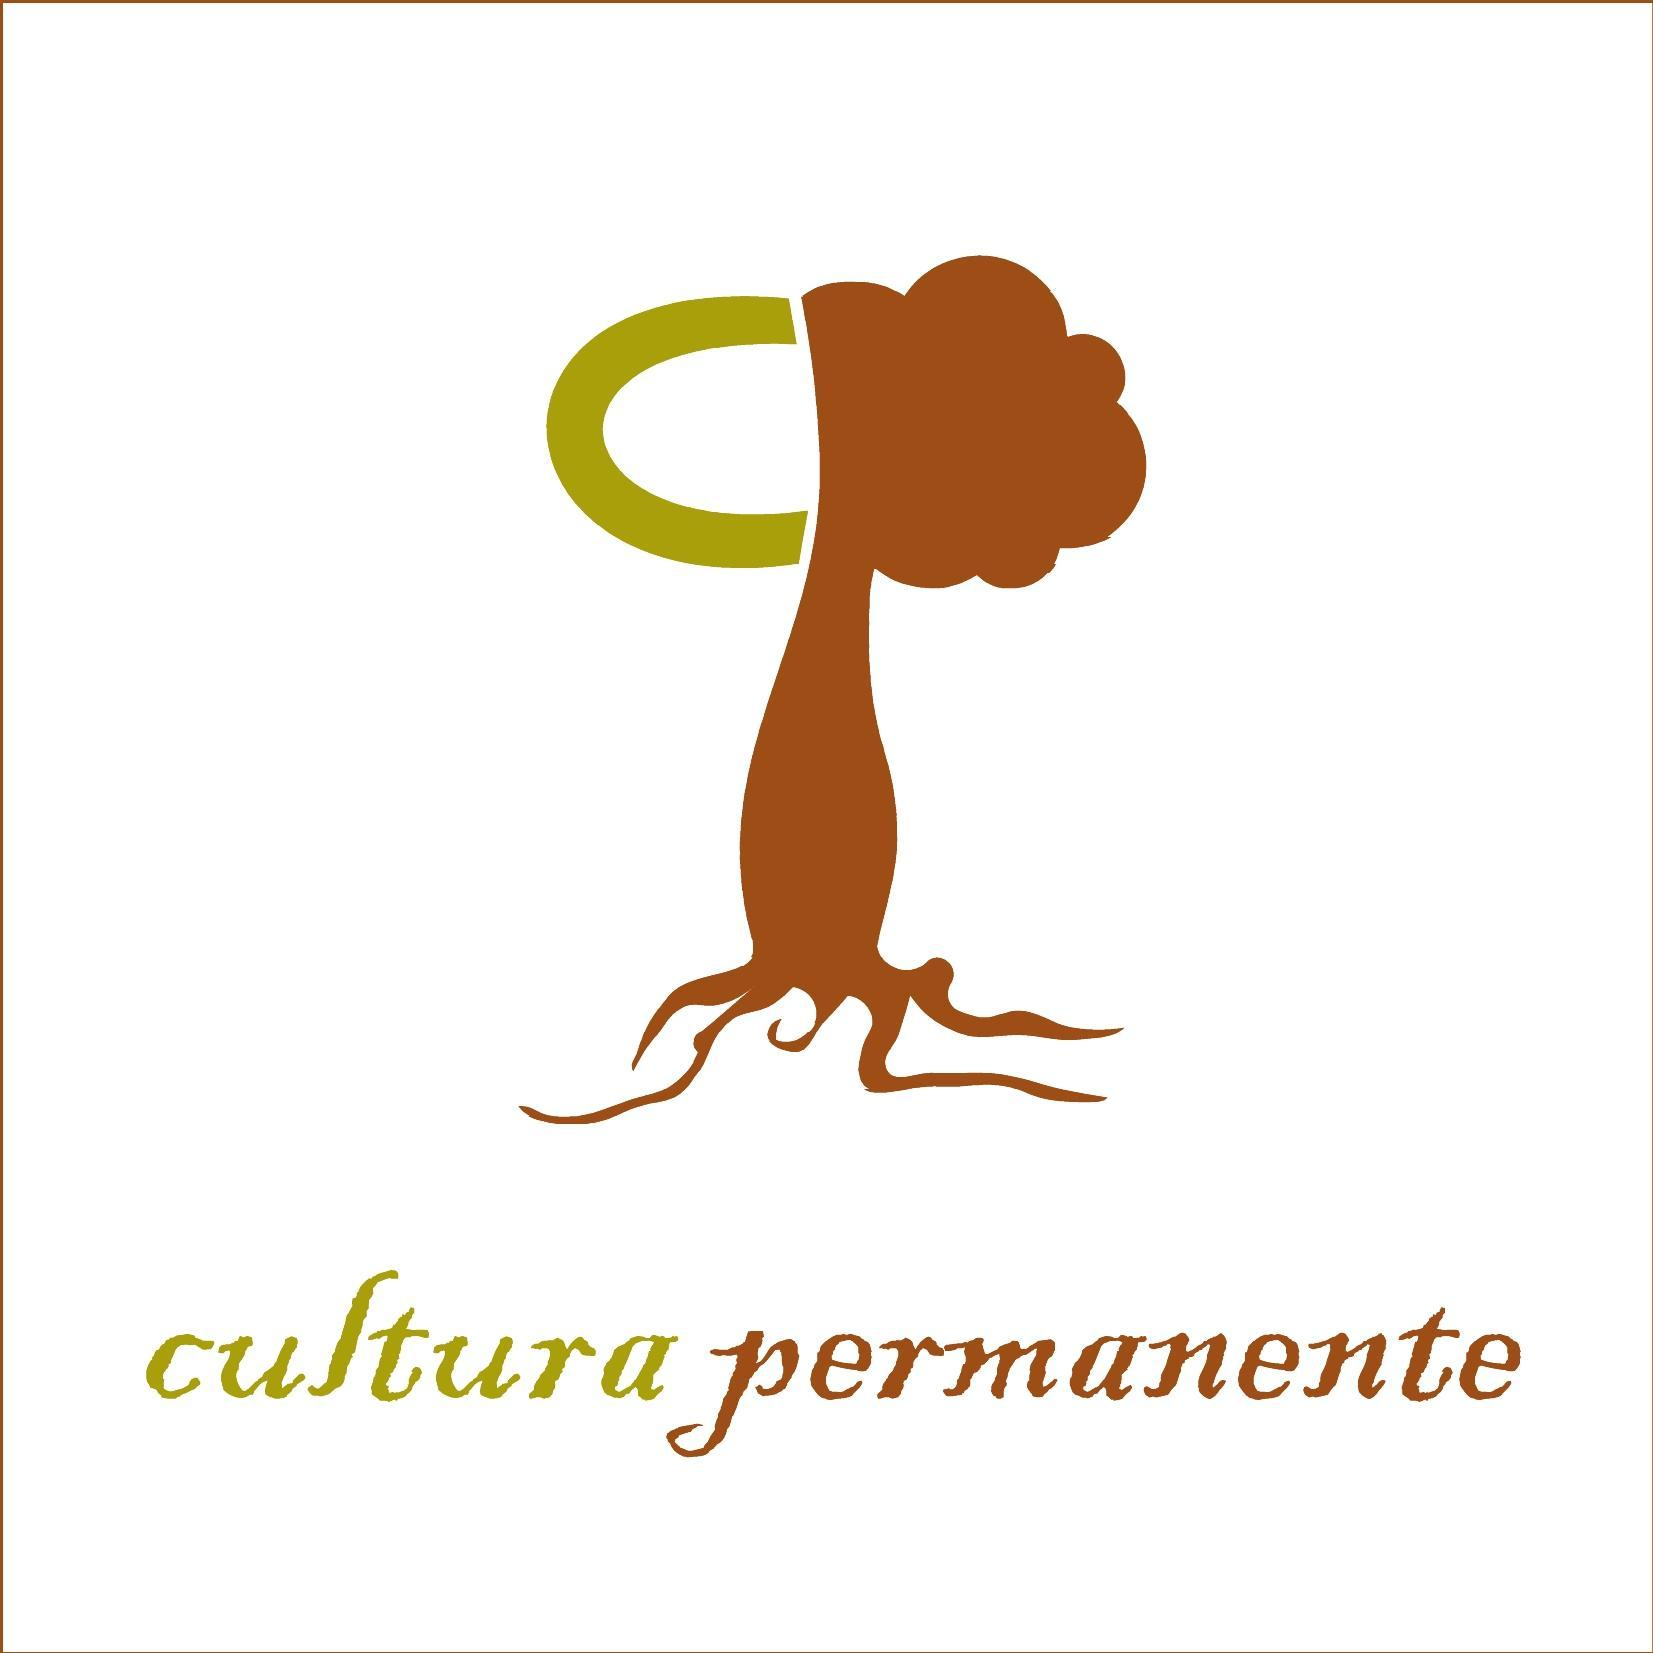 Cultura Permanente Asociación profile, rate, communicate and discover